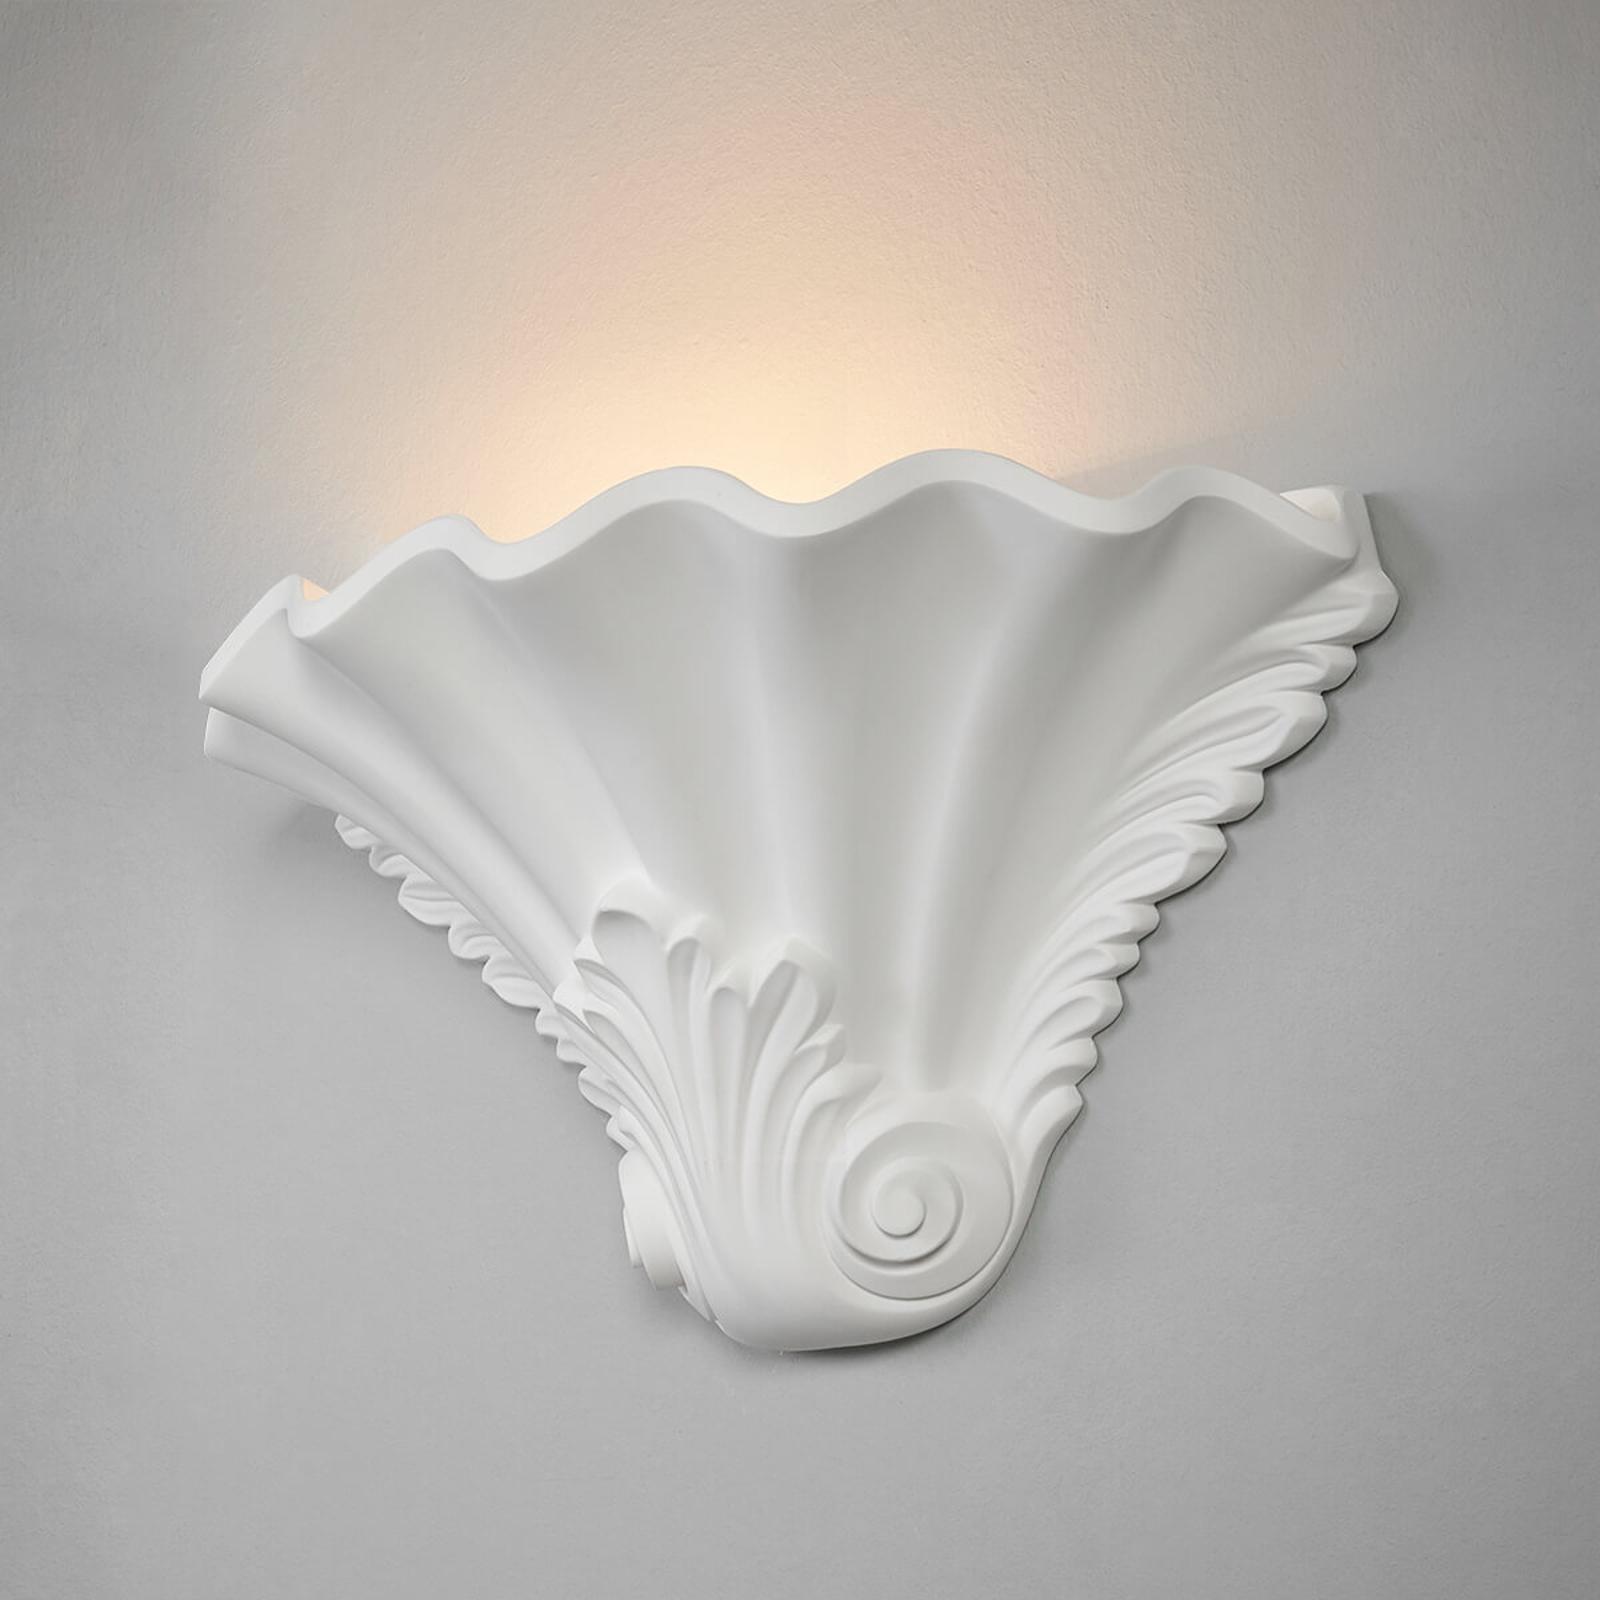 Gips wandlamp Lennet met reliëf in wit